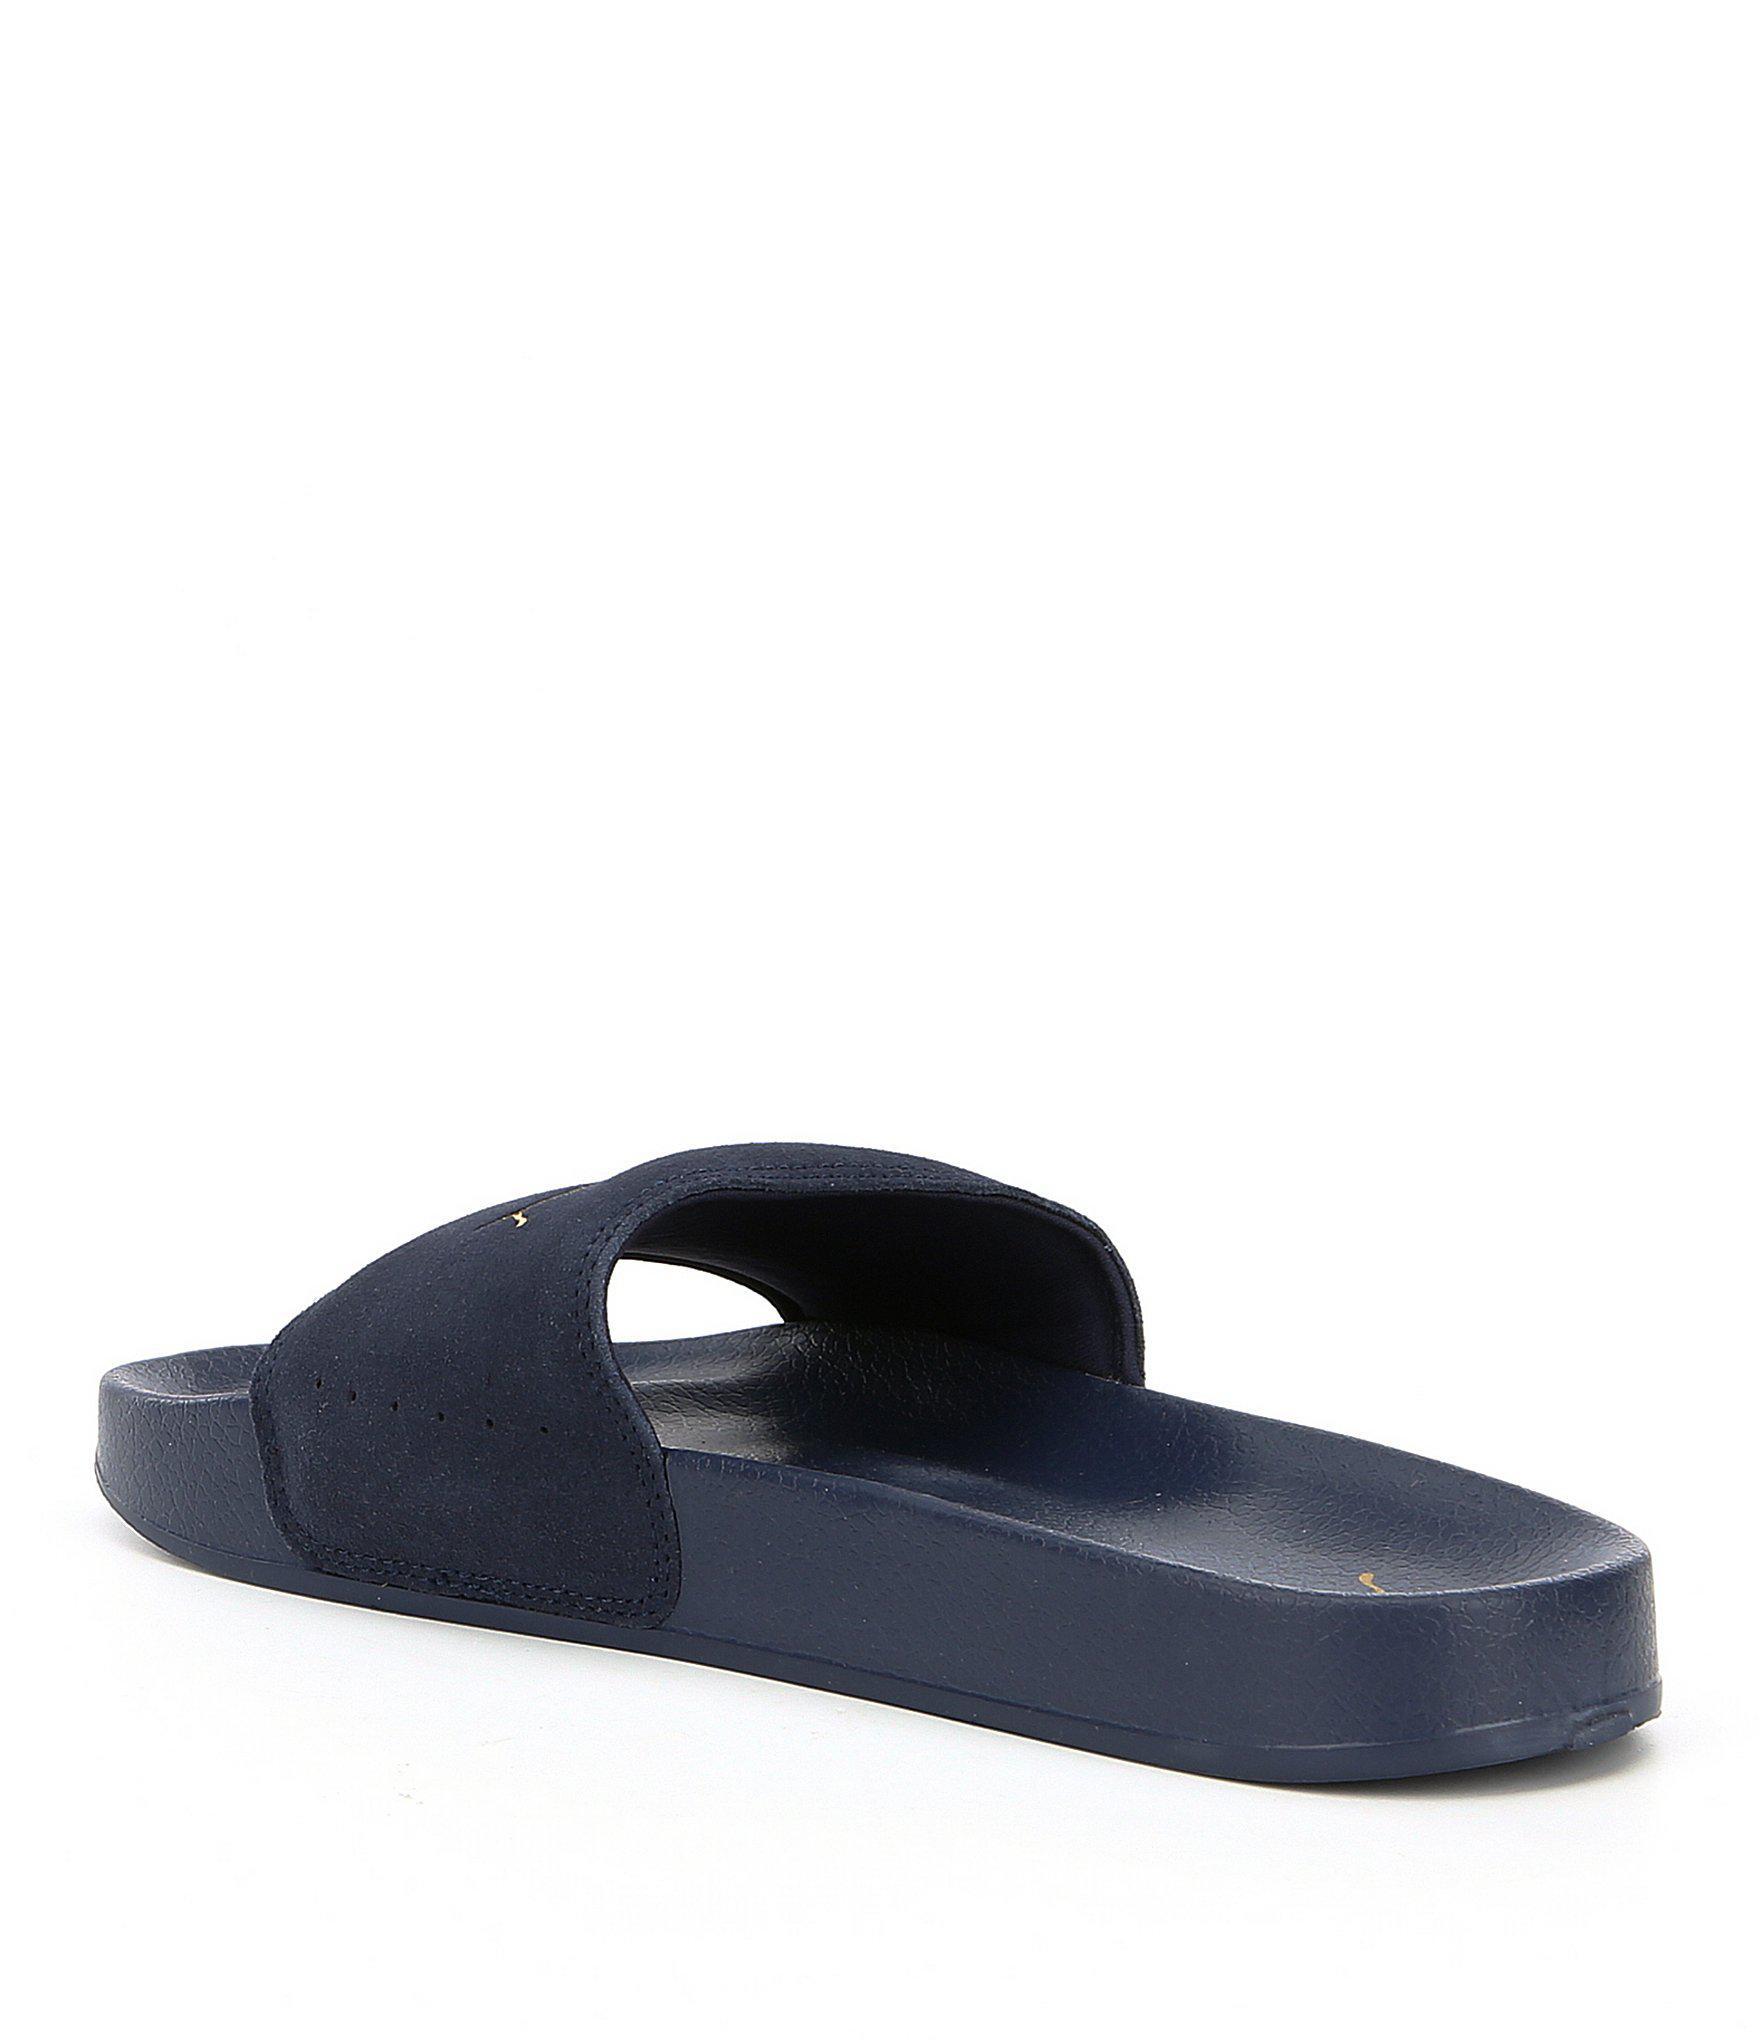 d298a36069e2 Lyst - PUMA Men s Leadcat Suede Slide-on Sandals in Blue for Men